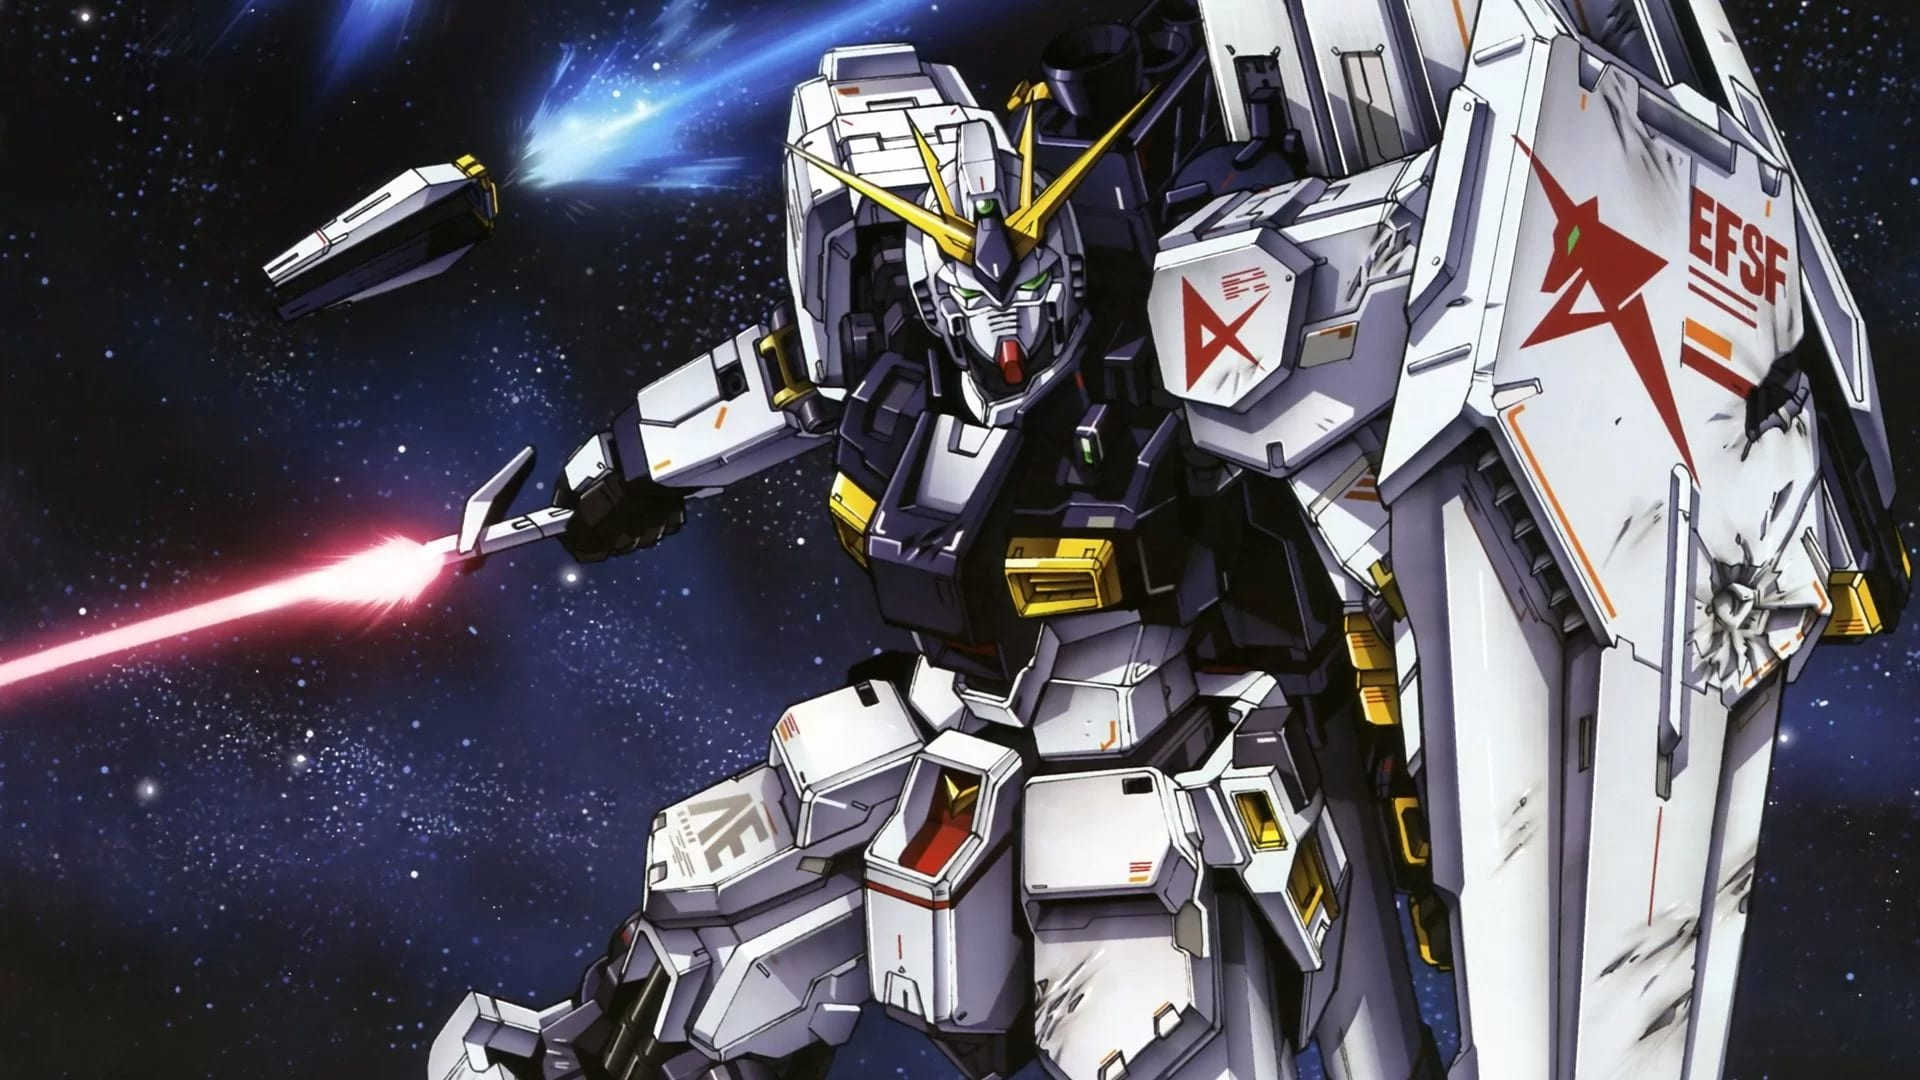 Gundam live action poster